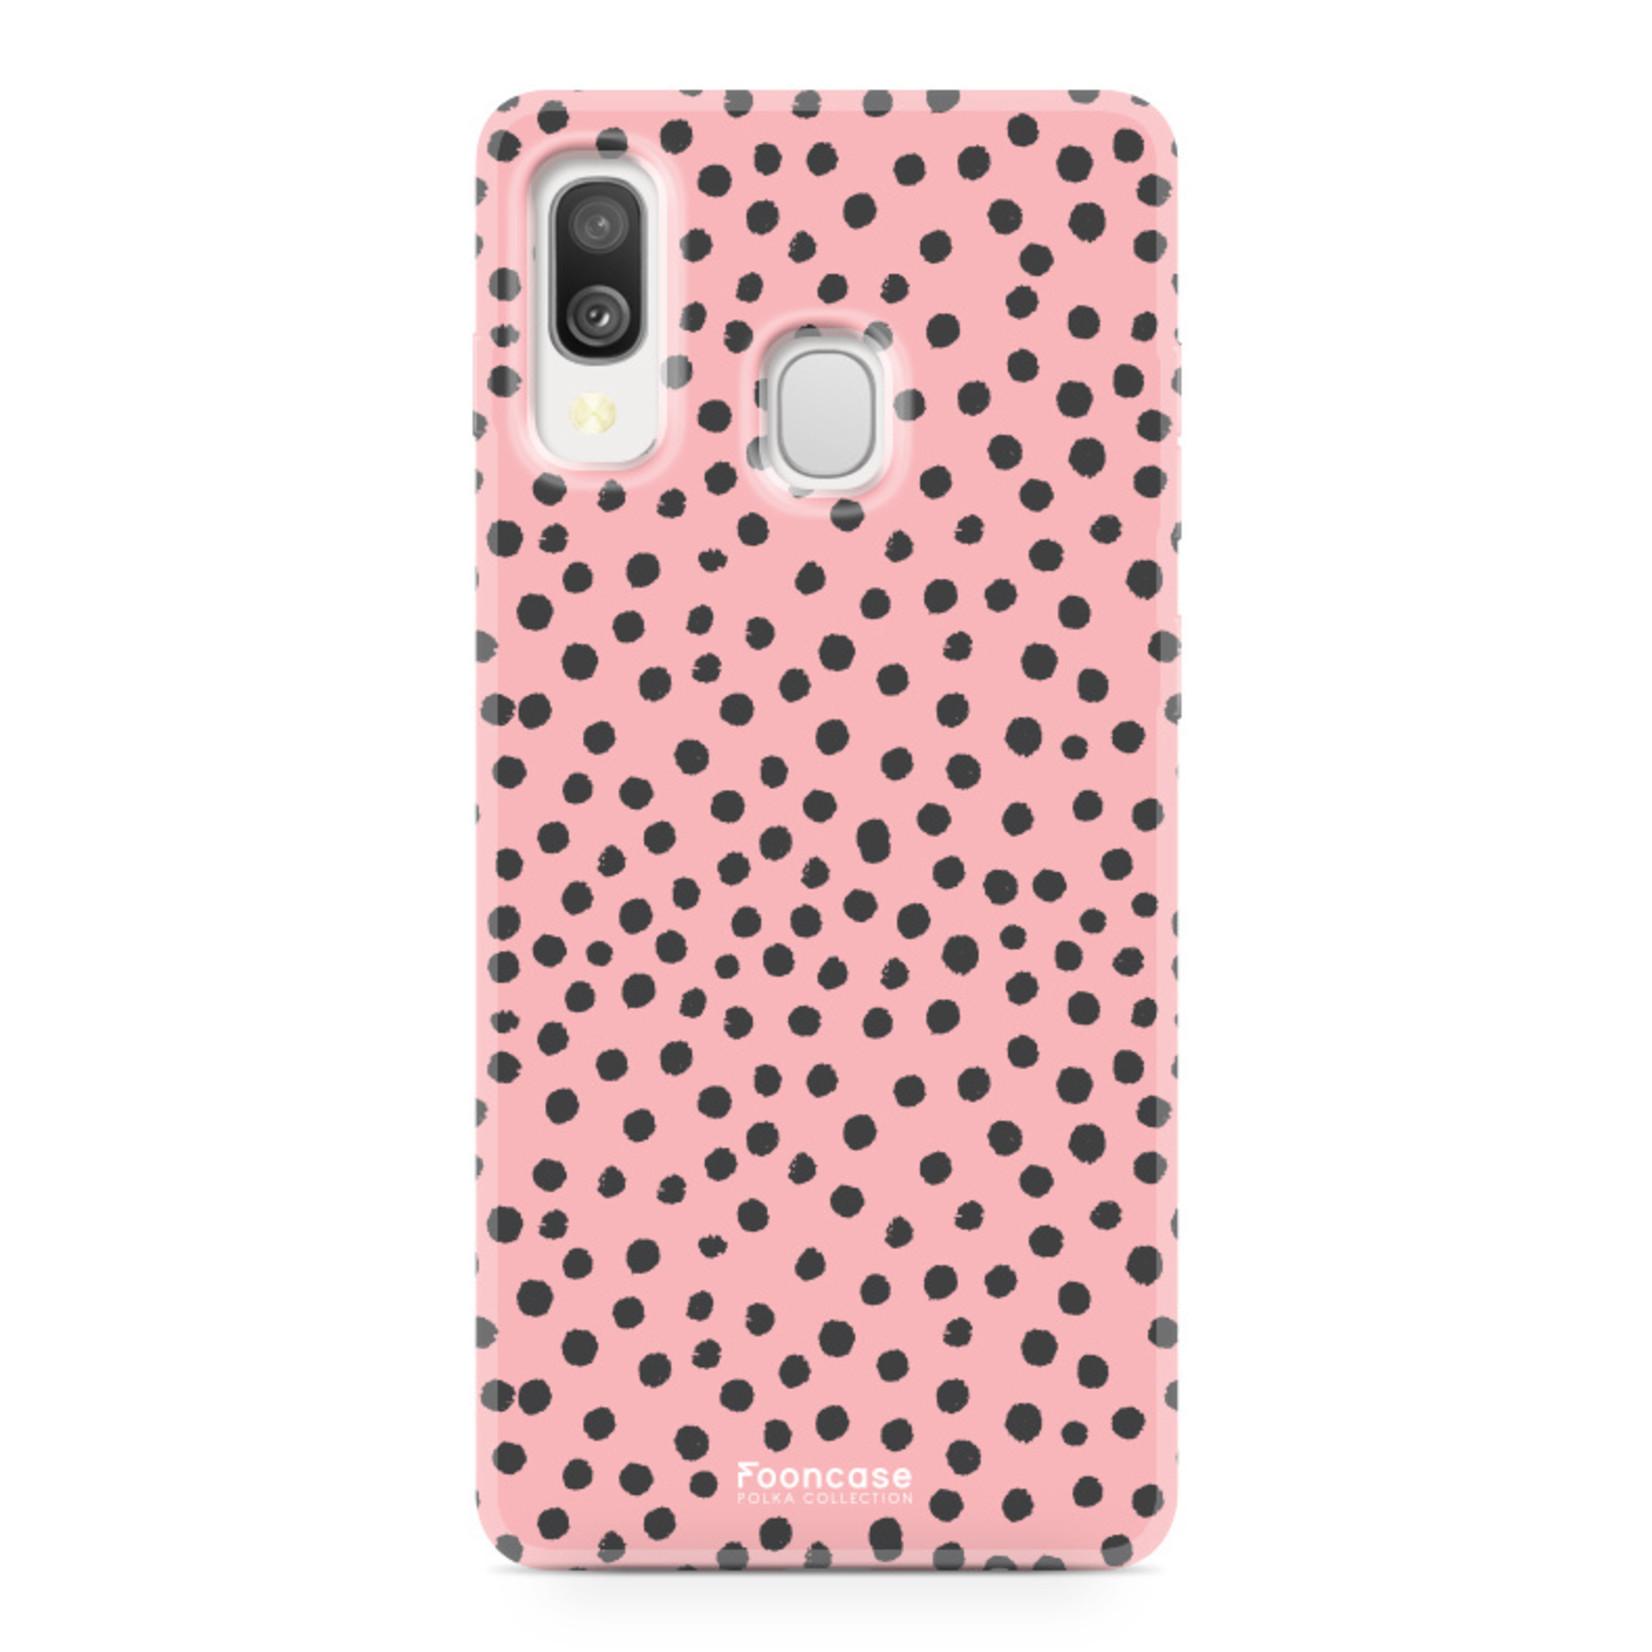 Samsung Galaxy A40 hoesje TPU Soft Case - Back Cover - POLKA COLLECTION / Stipjes / Stippen / Roze